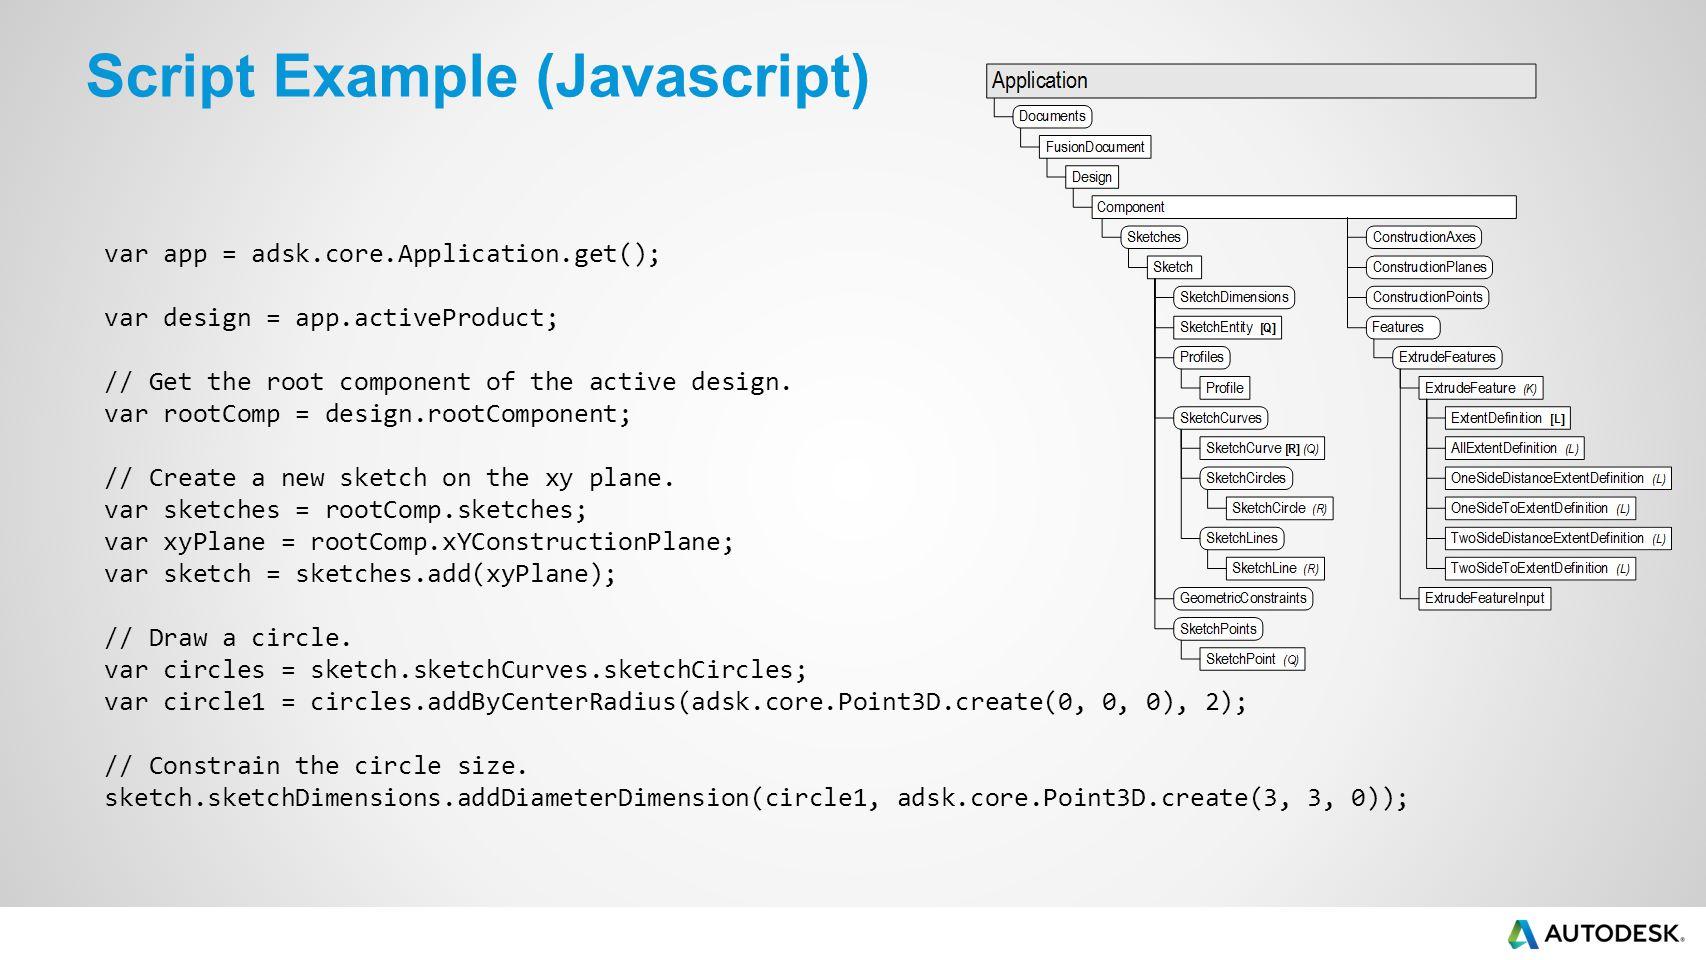 Script Example (Javascript)